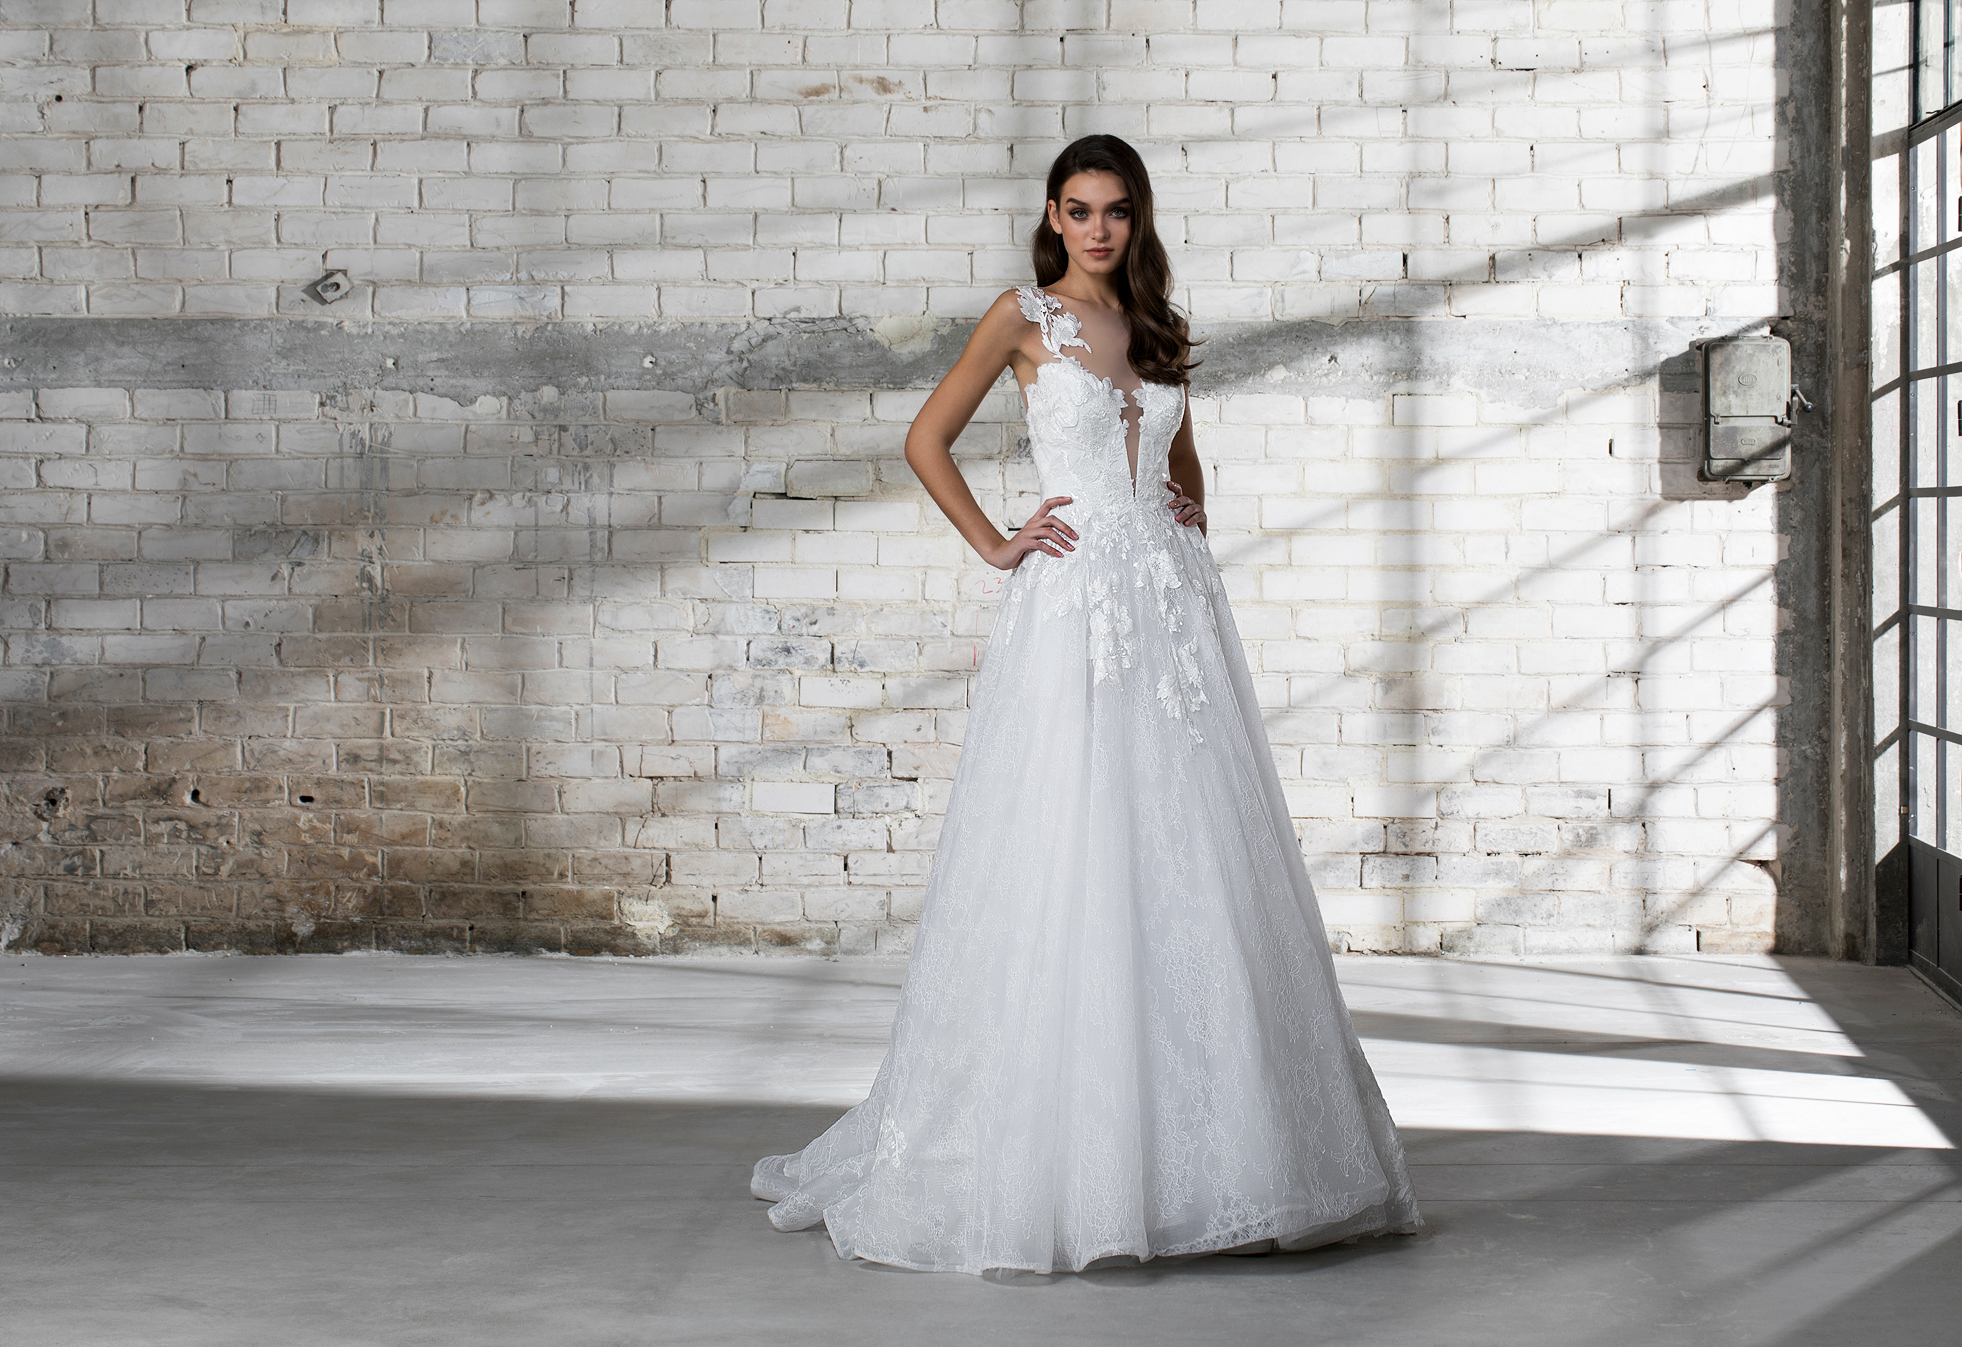 pnina tornai wedding dress spring 2019 a-line sleeveless embellished